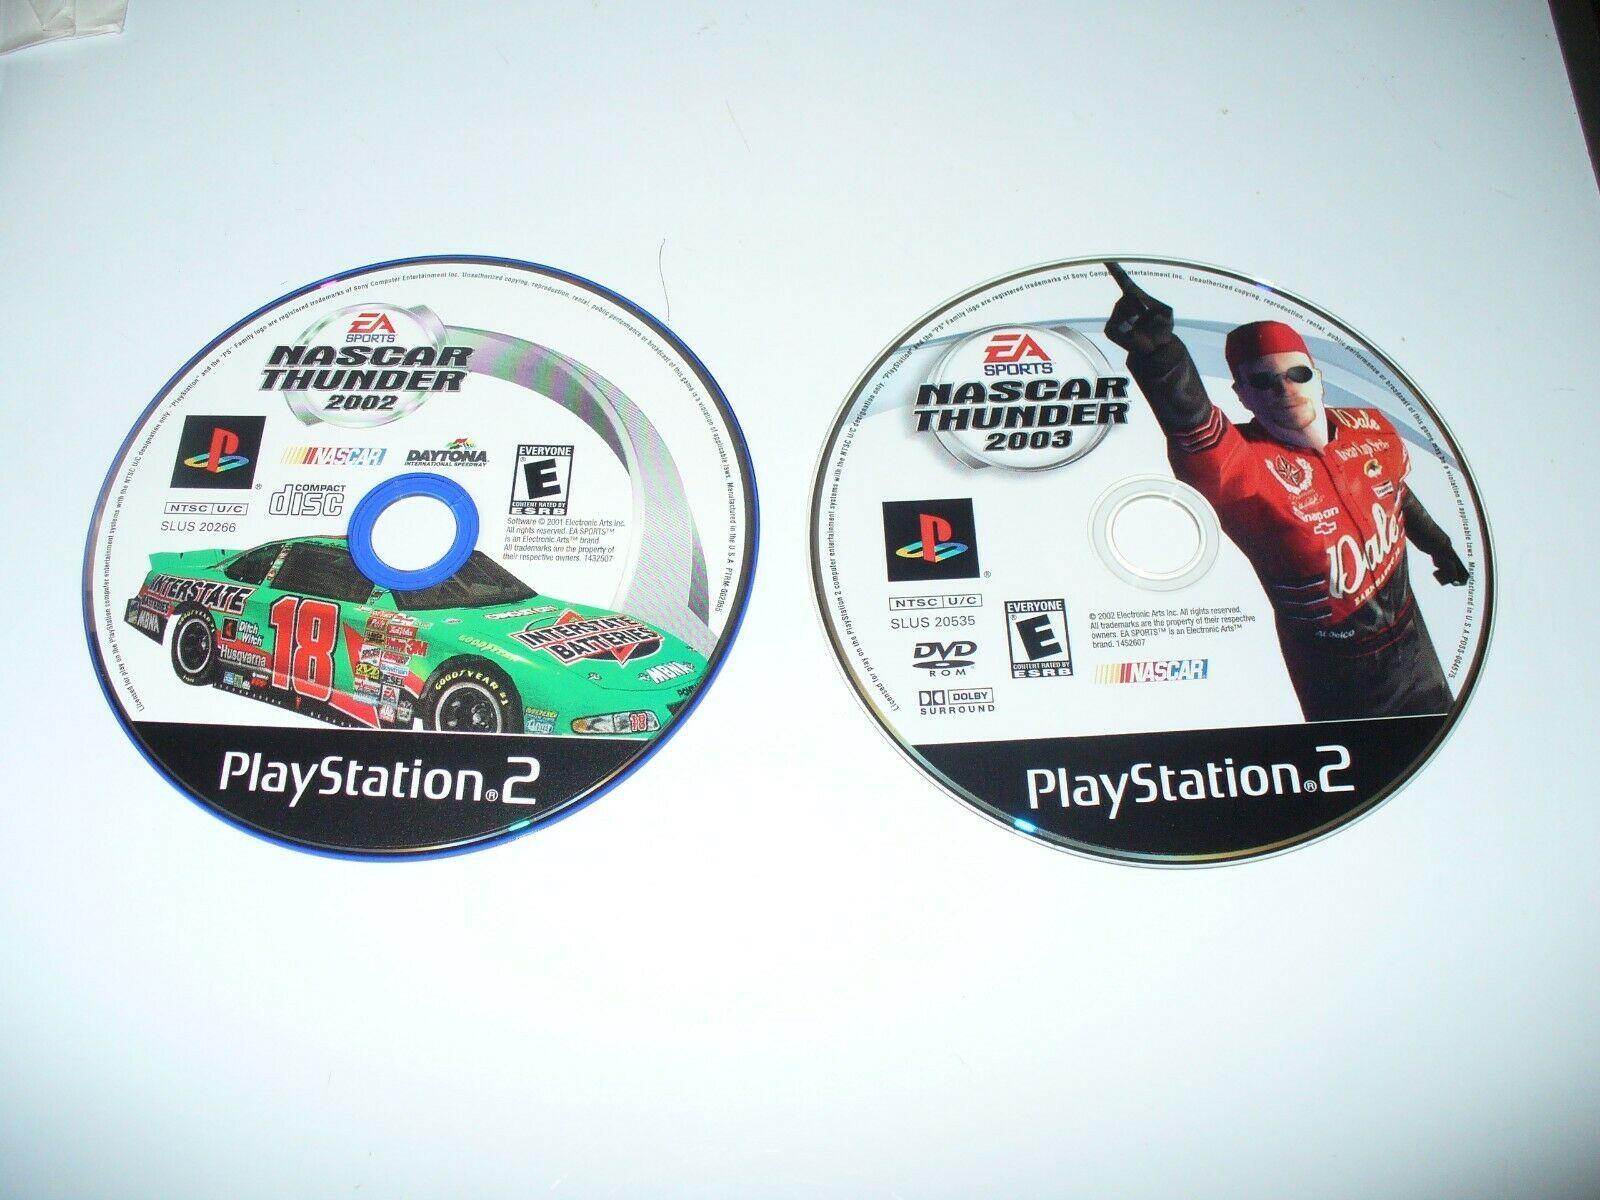 Lot of 2 NASCAR Thunder 2002 & 2003 (Sony PlayStation 2) - Discs & Generic Case - $5.94